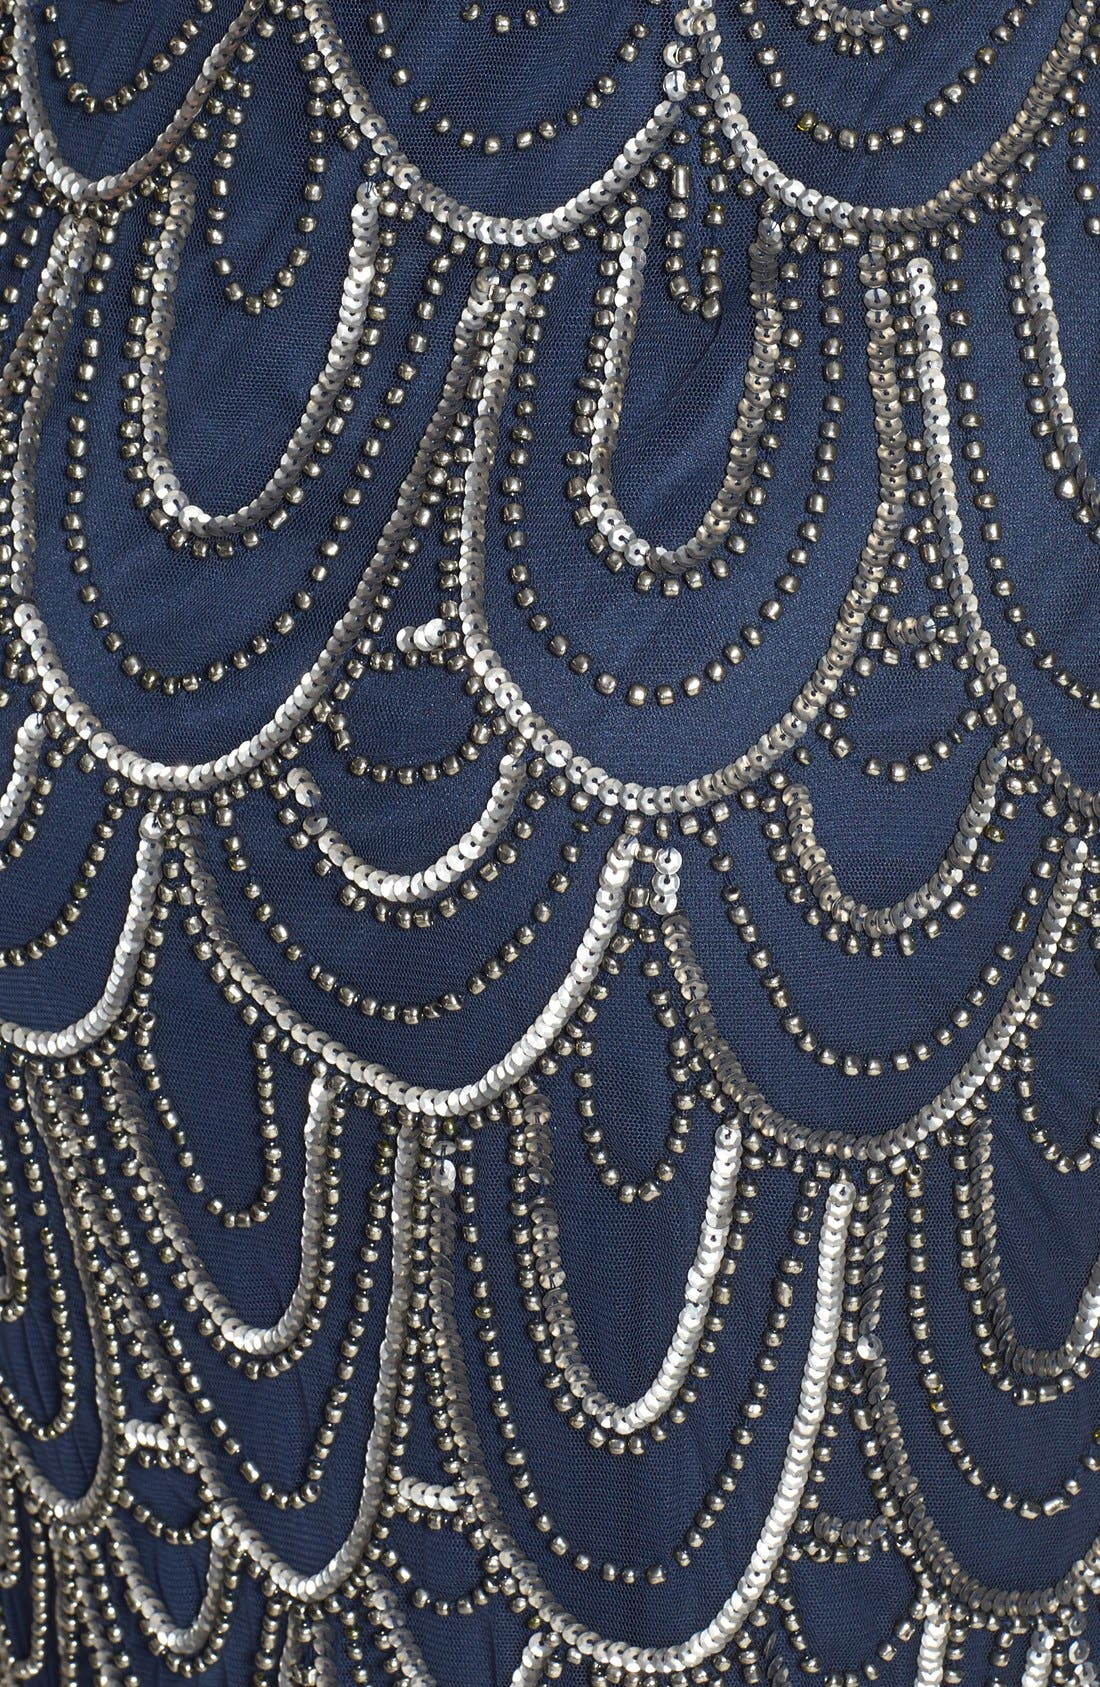 Embellished Mesh Sheath Dress,                             Alternate thumbnail 78, color,